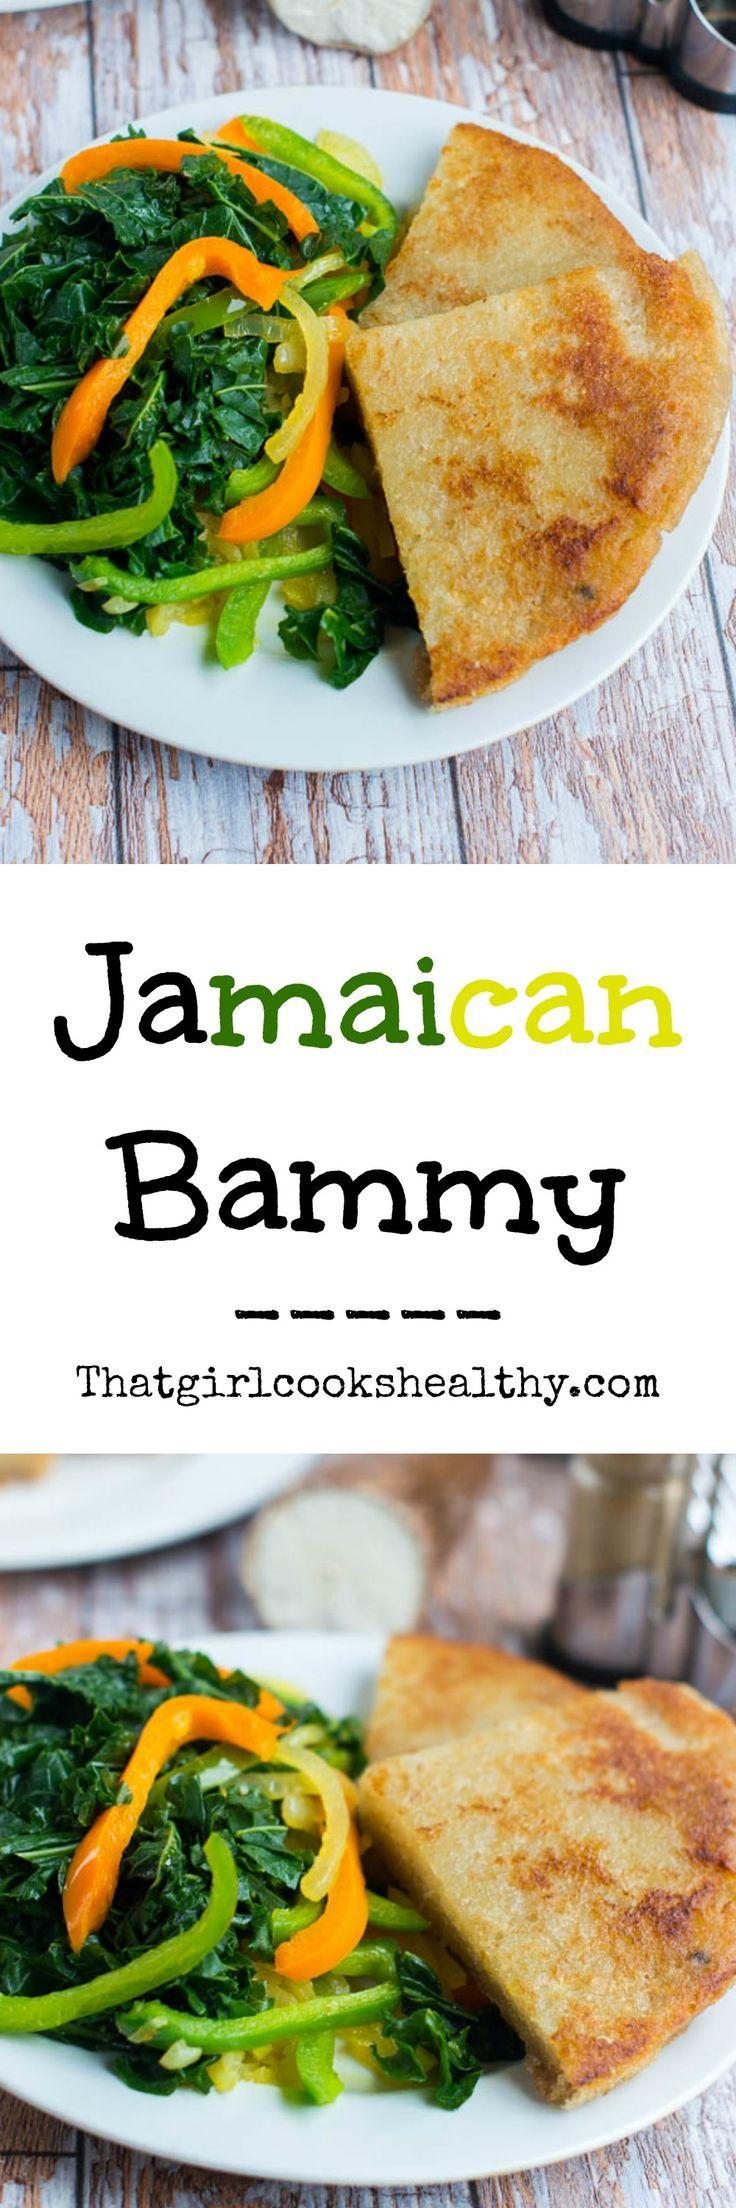 100 best Carribean Food images on Pinterest | Caribbean food ...